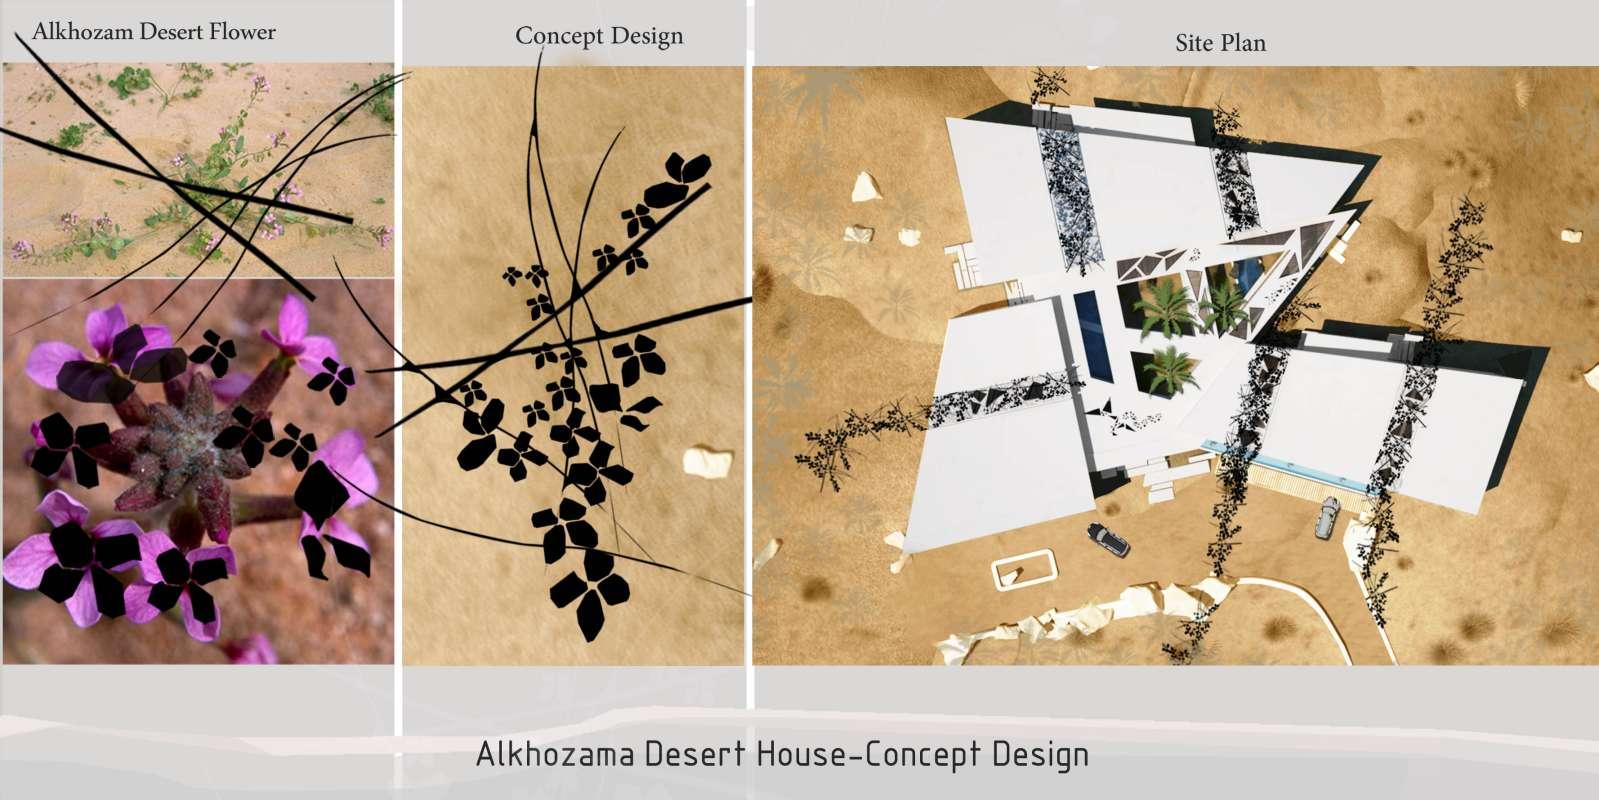 10-Alkhozama-Desert-Casa-de-Ark-Kassam-Arquitectos